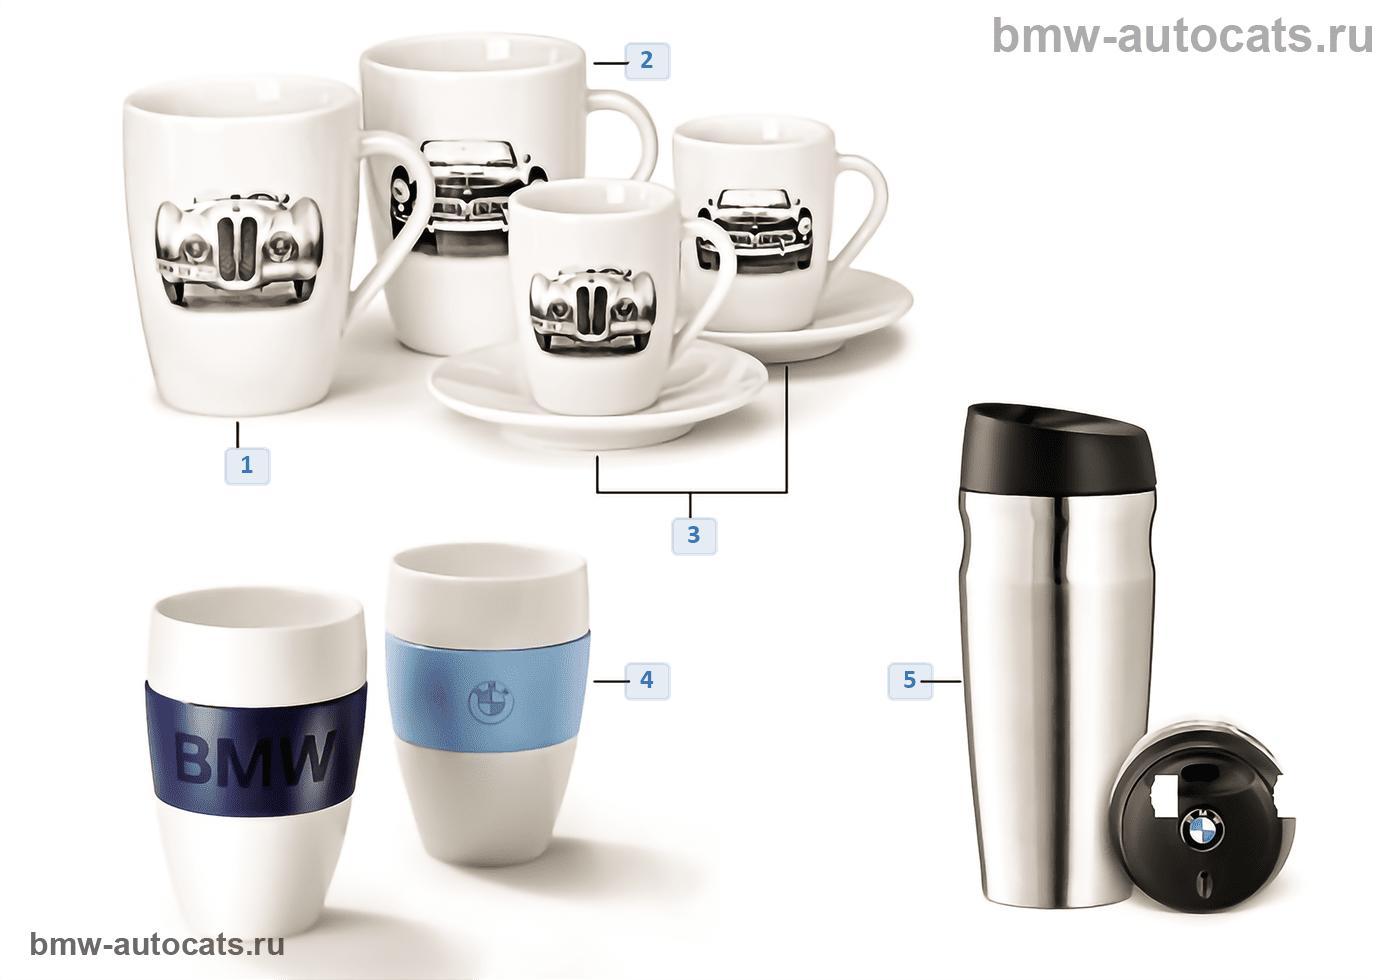 BMW Collection — чашки/бутылки 2012/13